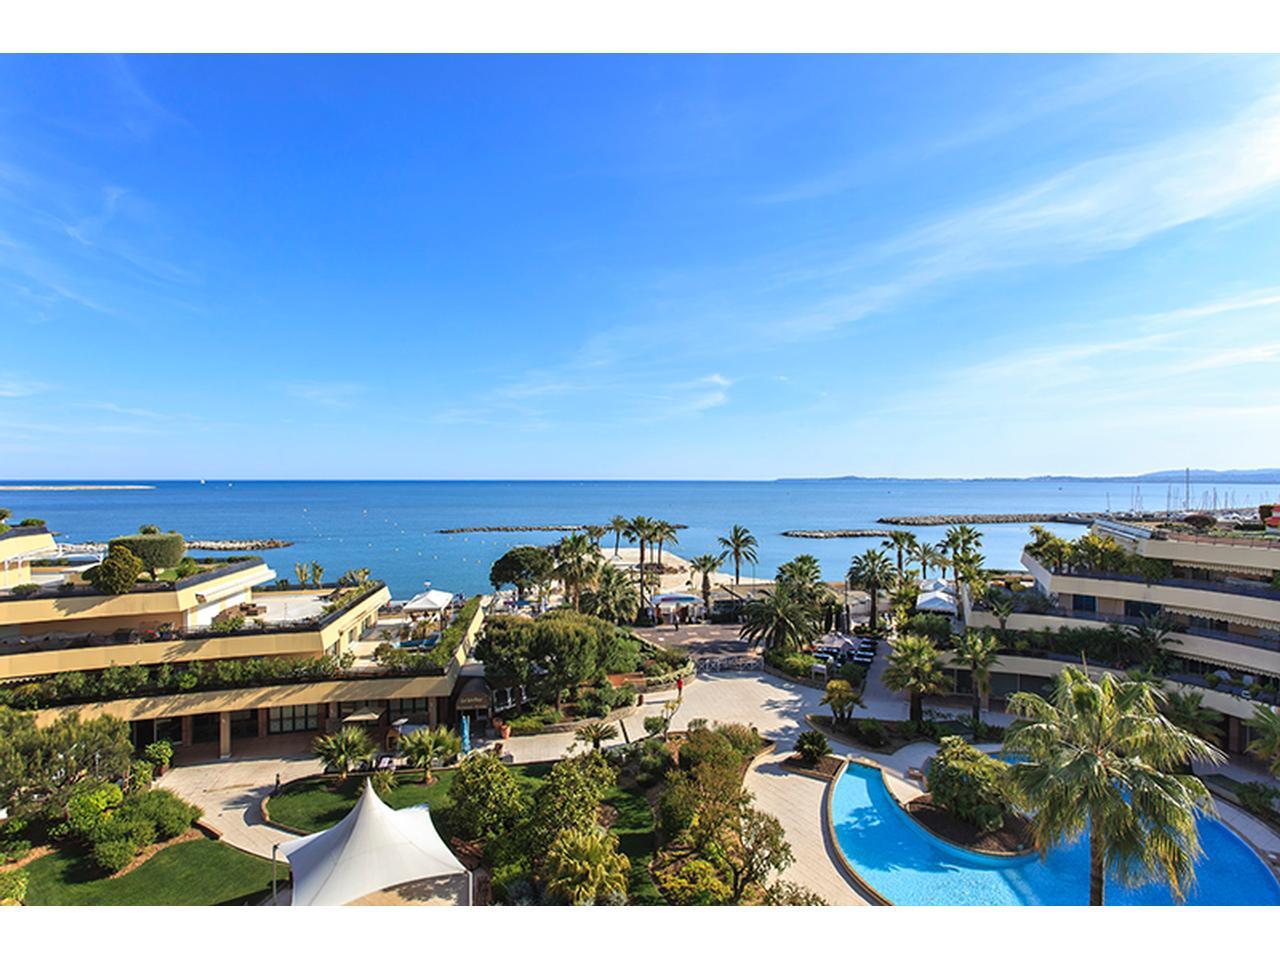 Immobilier nice vue mer appartement st laurent du var - Restaurant indien port saint laurent du var ...